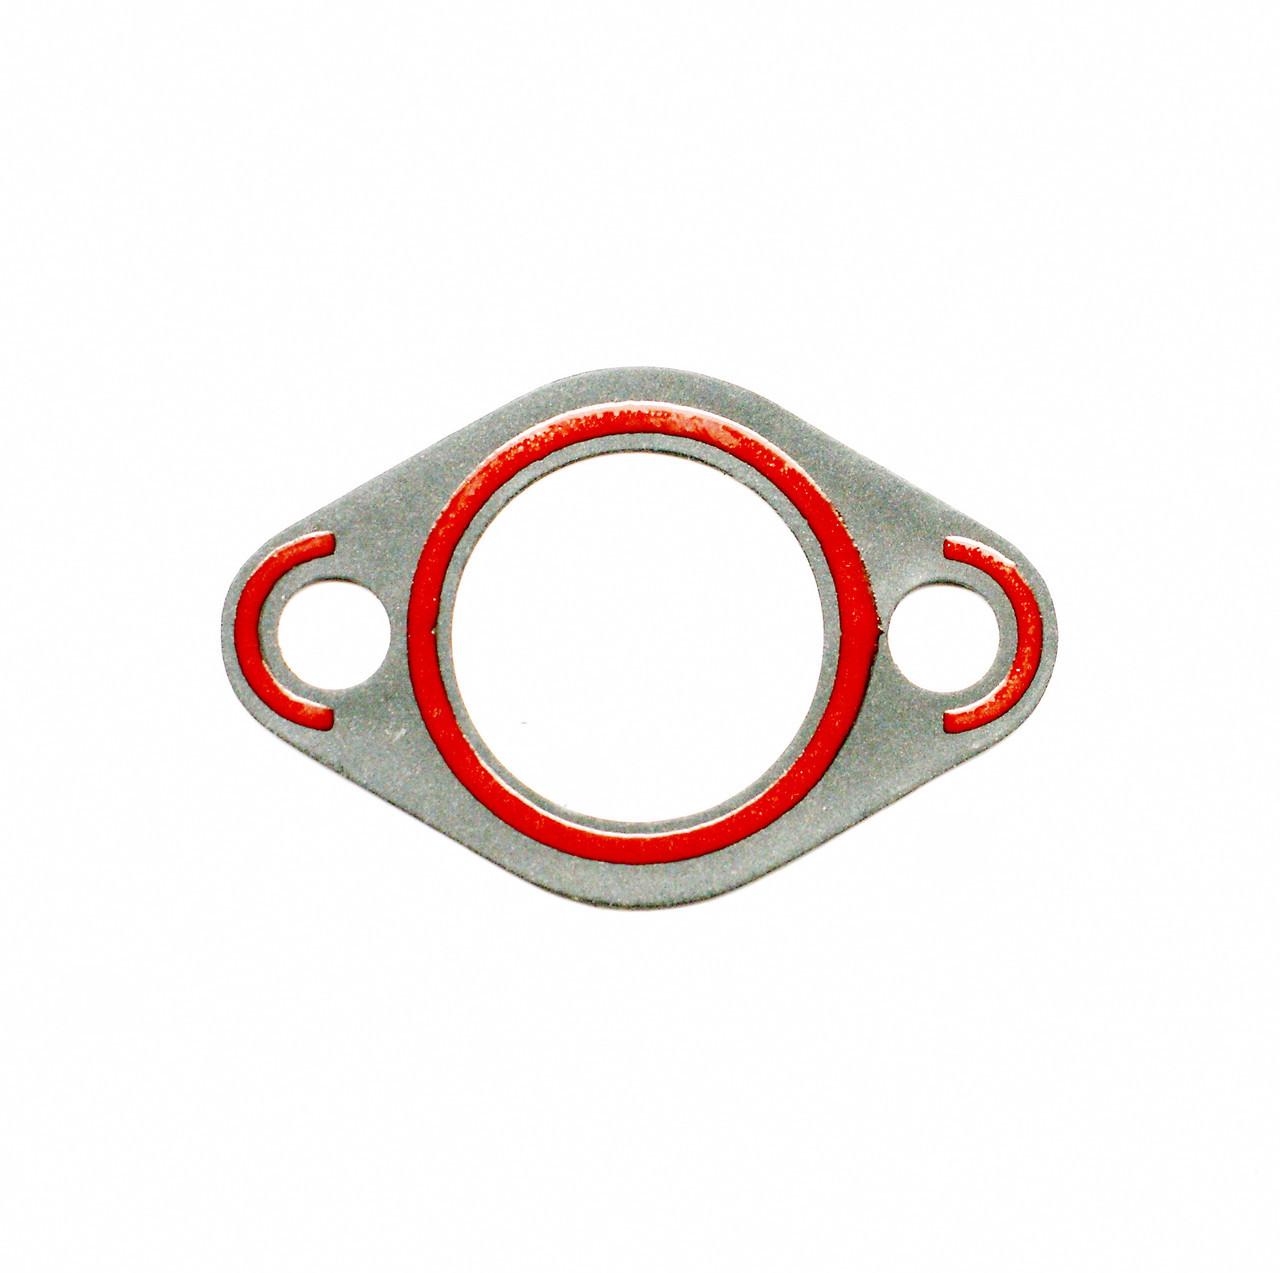 Прокладка маслозаборной трубки  Cummins N Series 157551